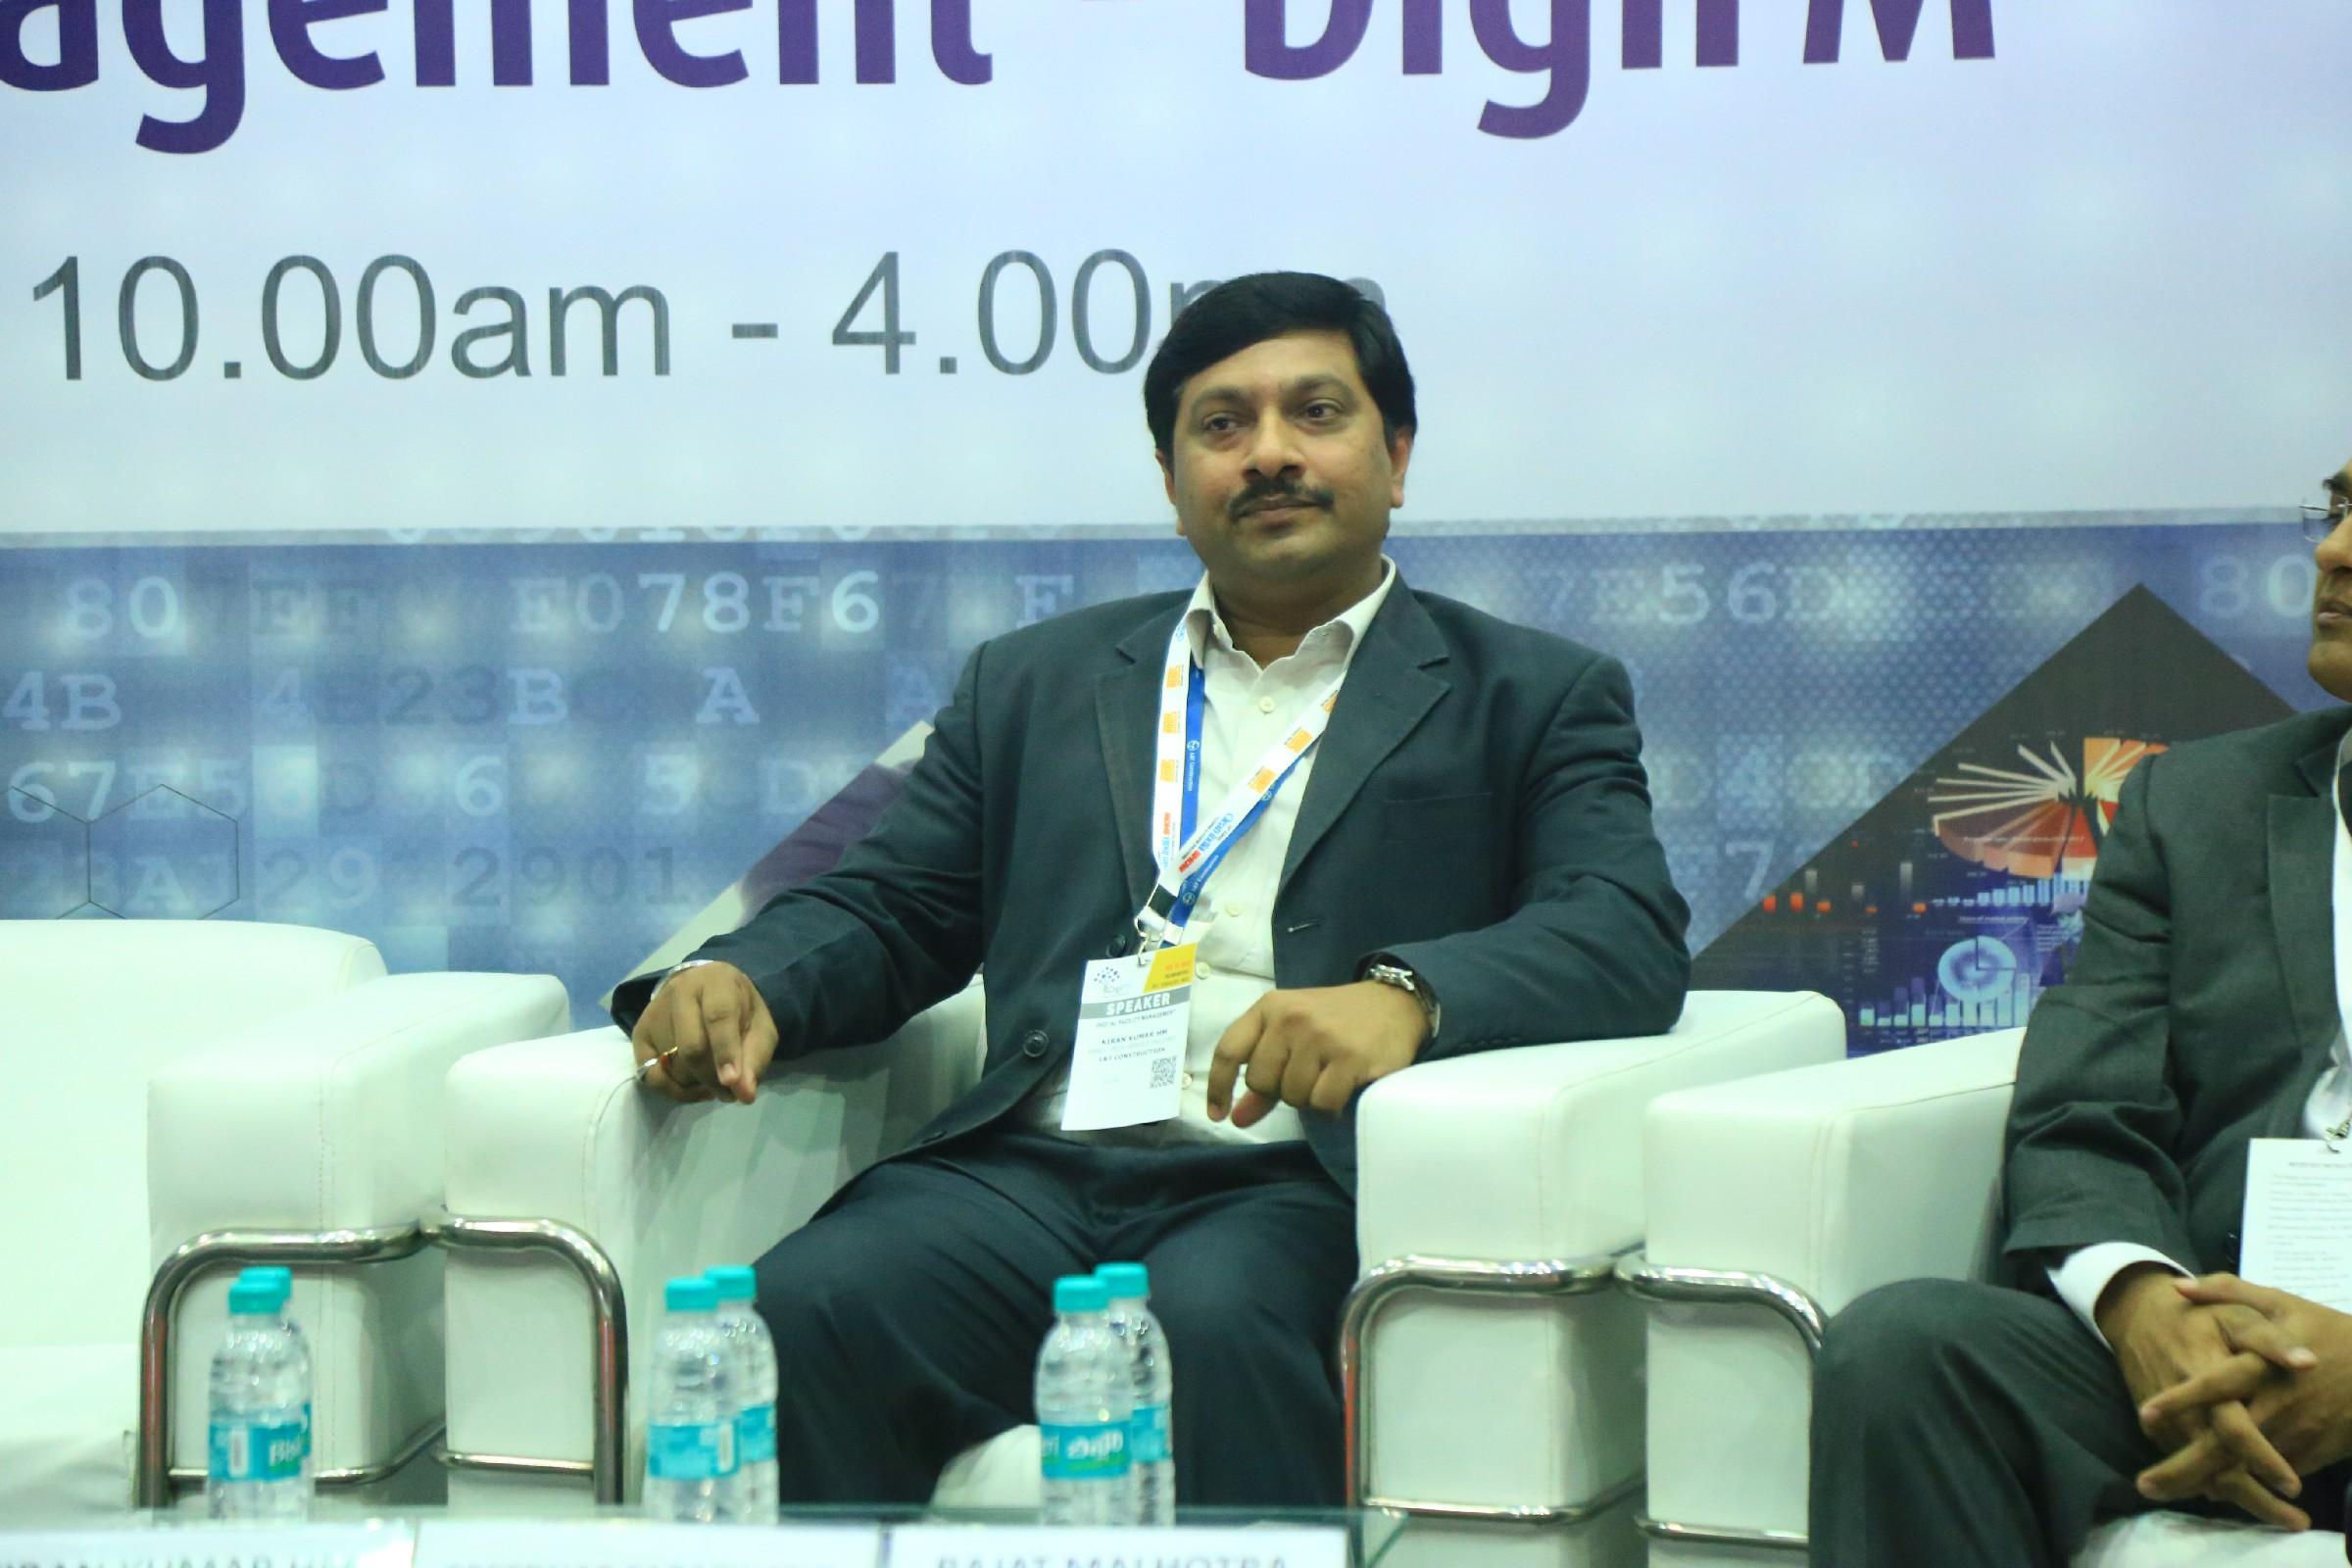 Kiran-Kumar-HM-Head-Tech-Service-Delivery-LT-Construction